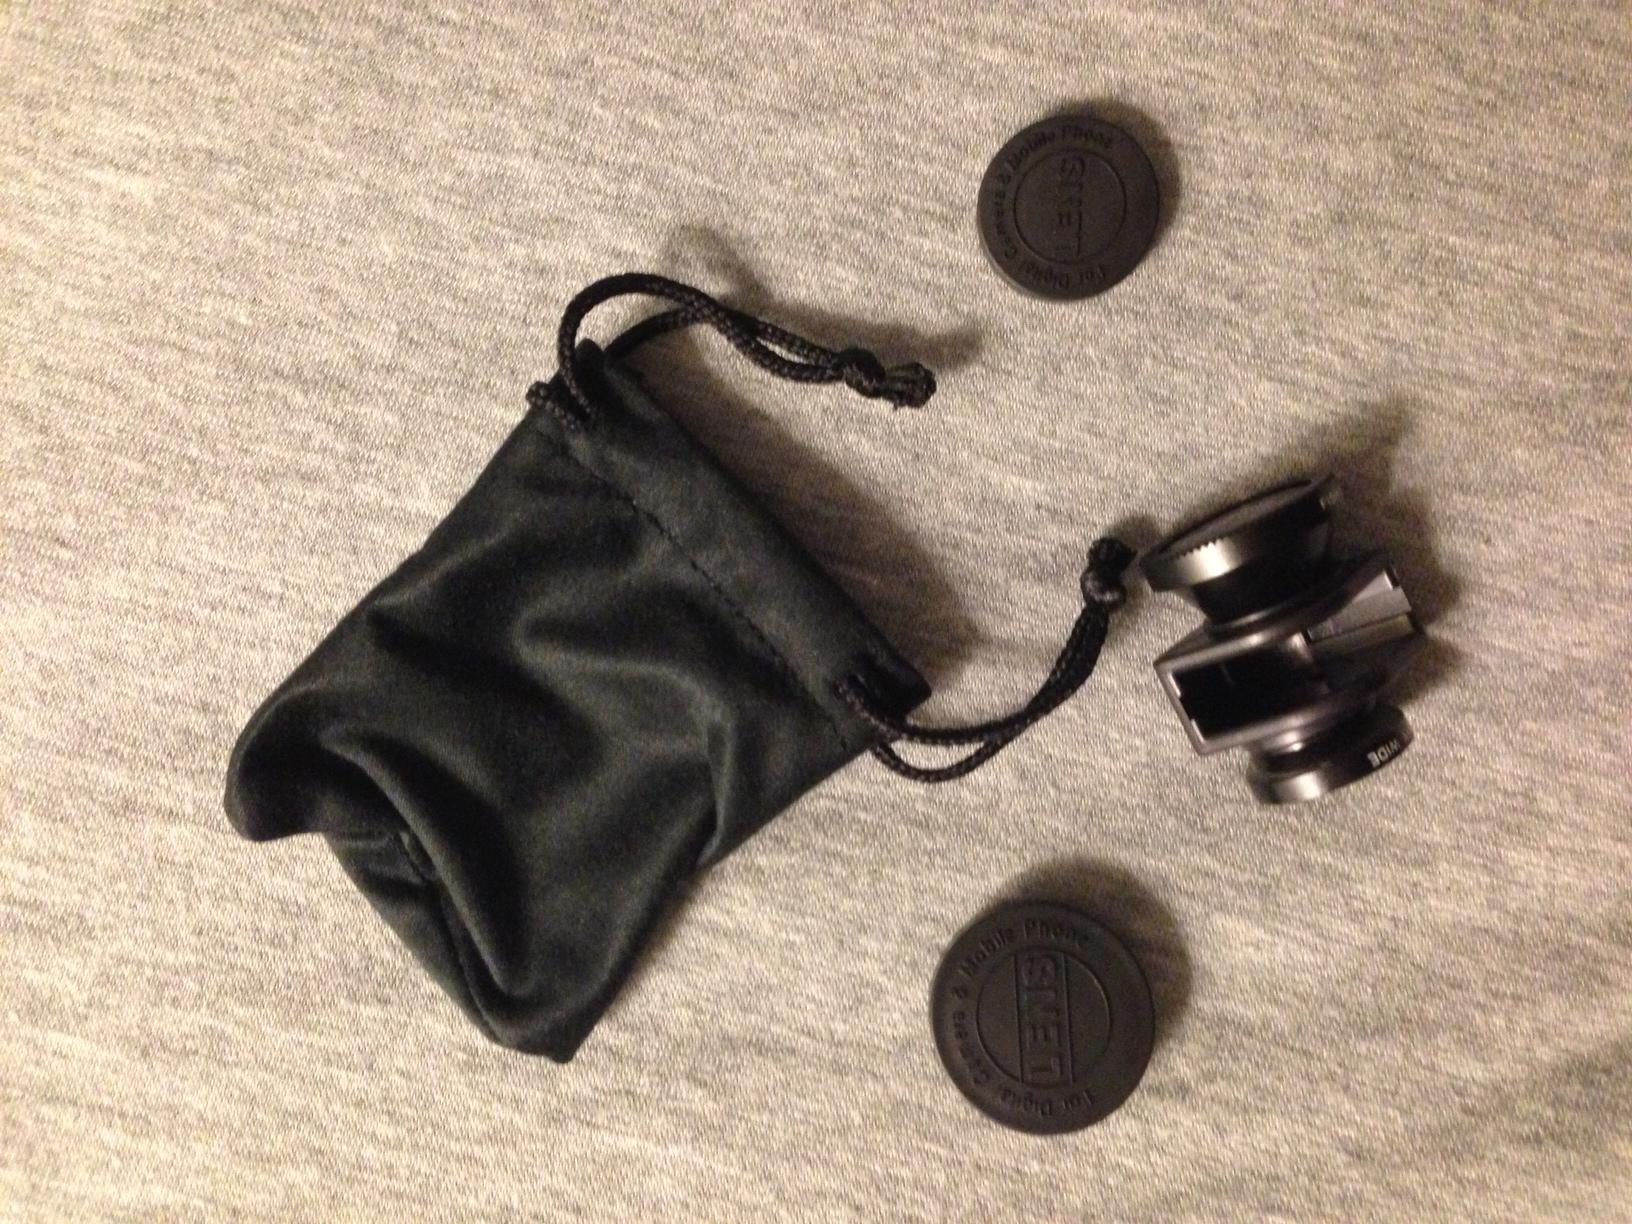 kit-objectif-iphone